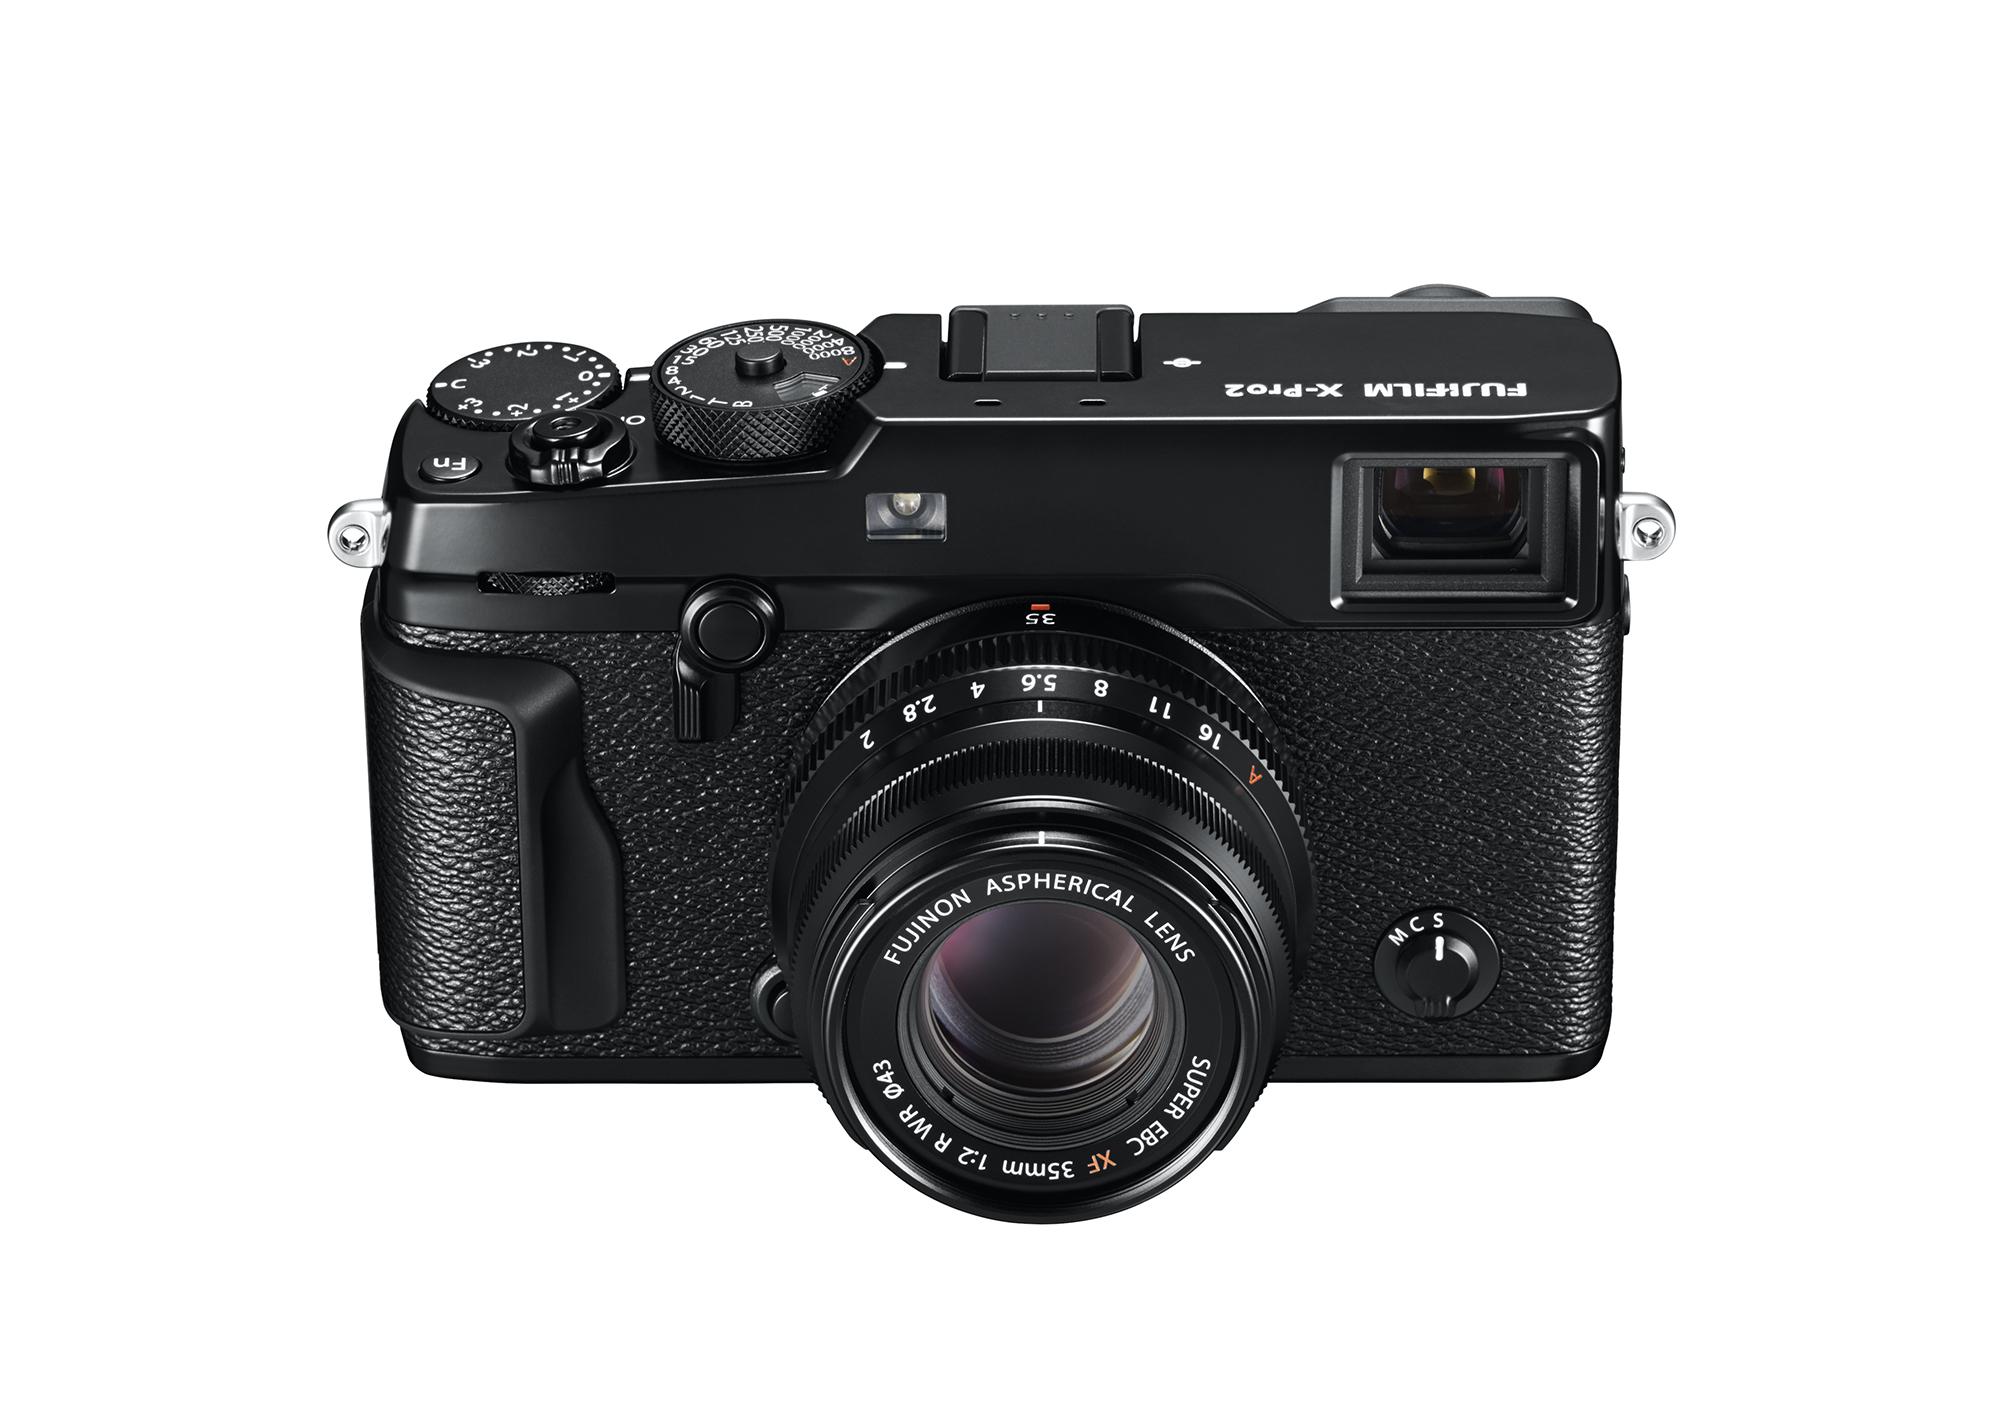 05_X-Pro2_BK_Front_Top_35mm_White.jpg